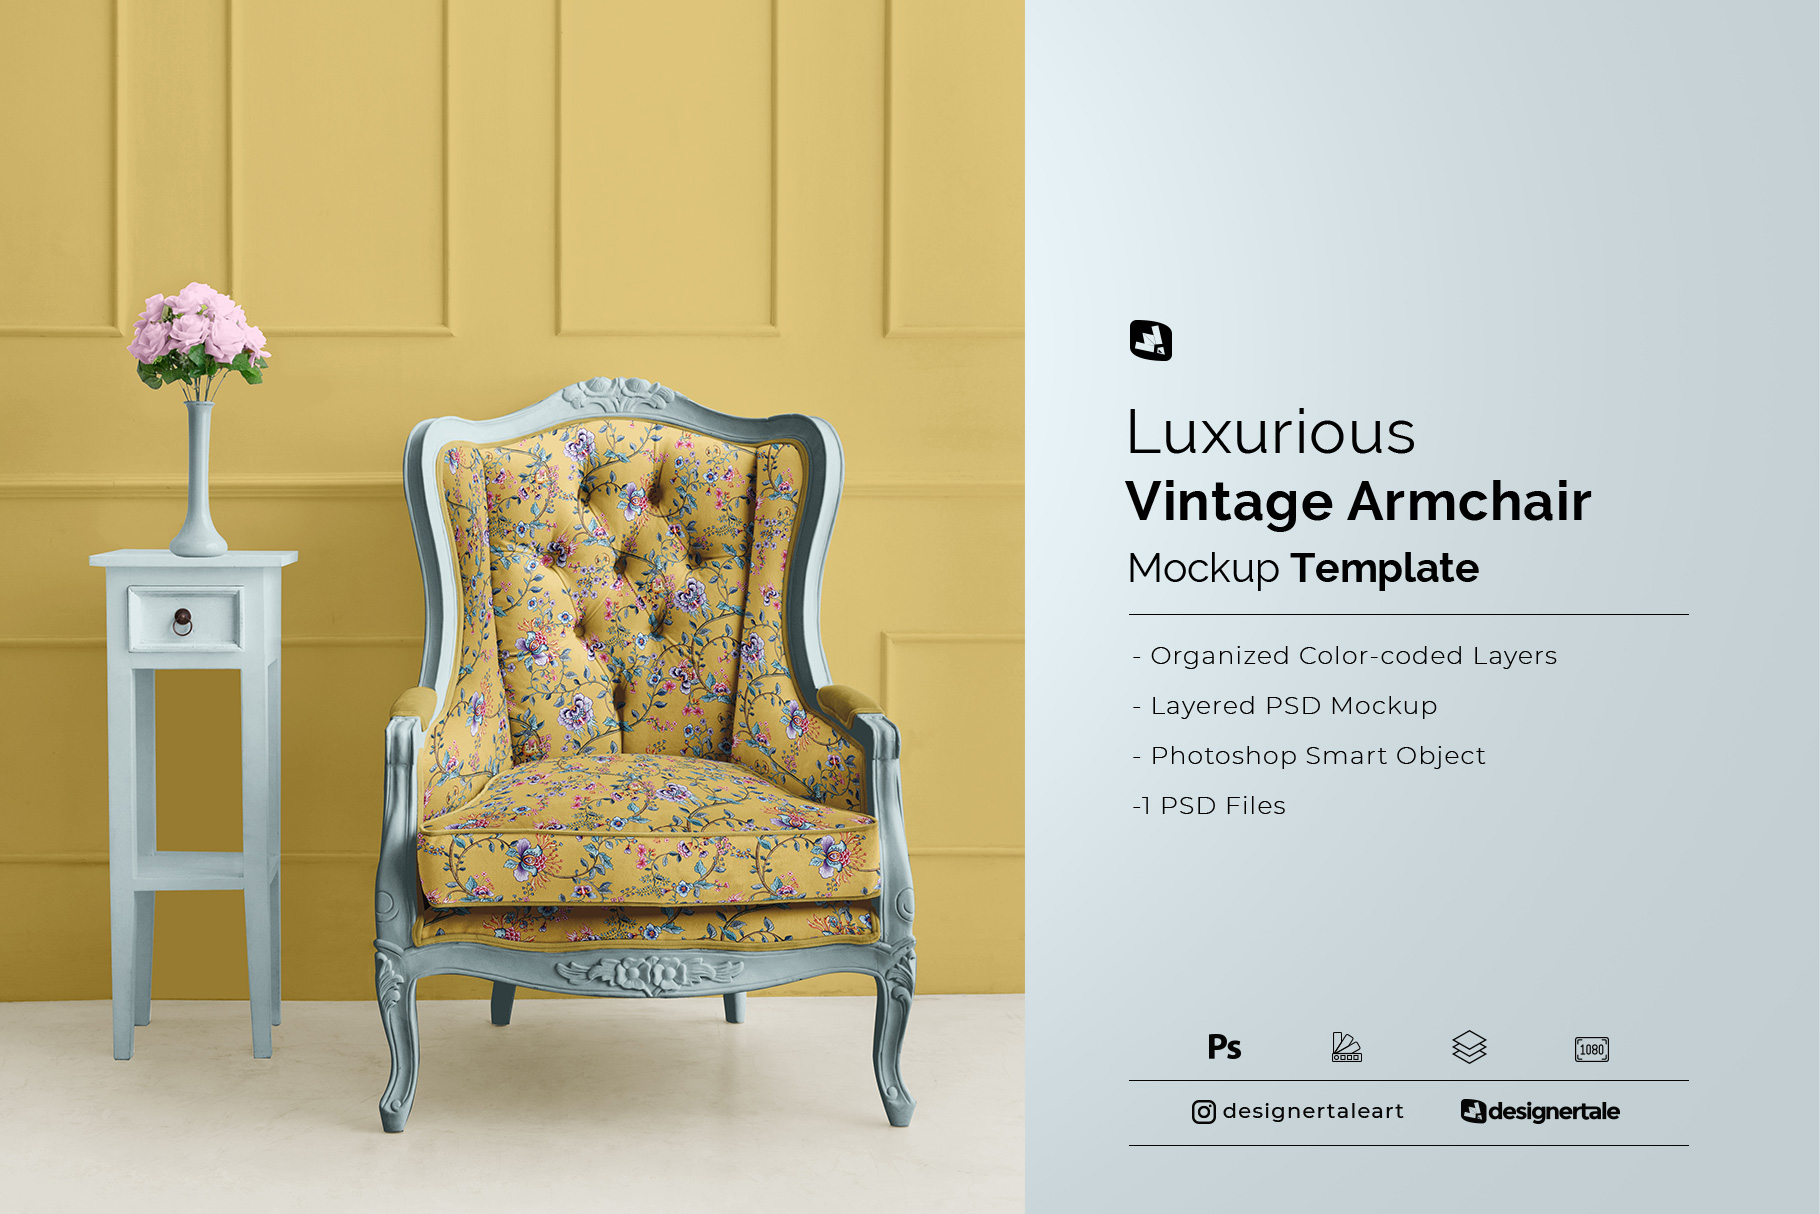 luxurious vintage armchair mockup